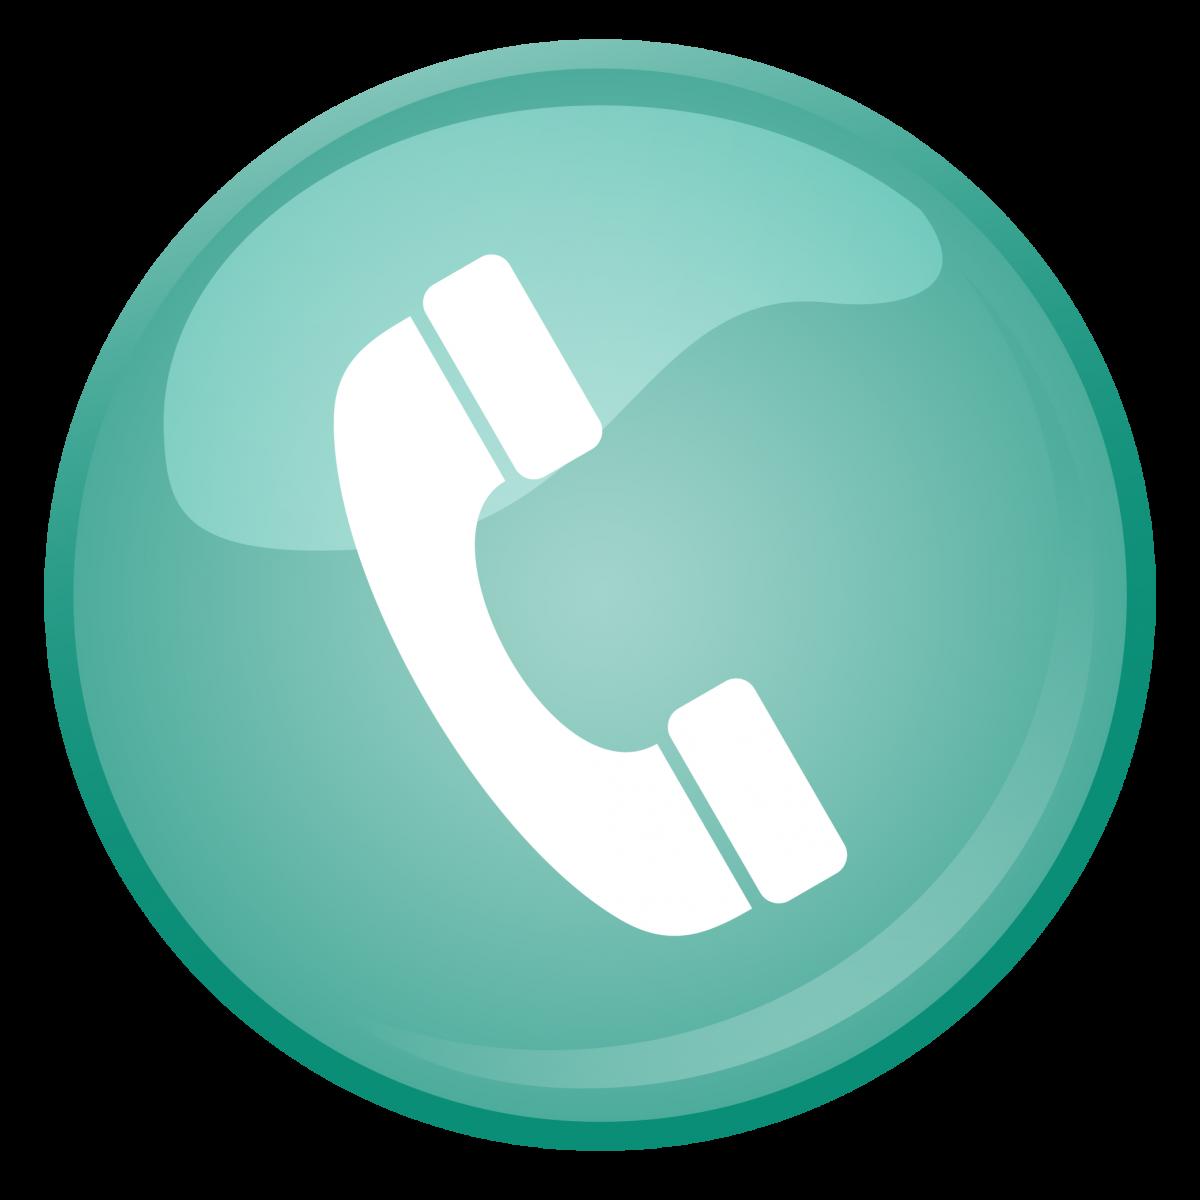 SHL_icon_telephonehelpline.png